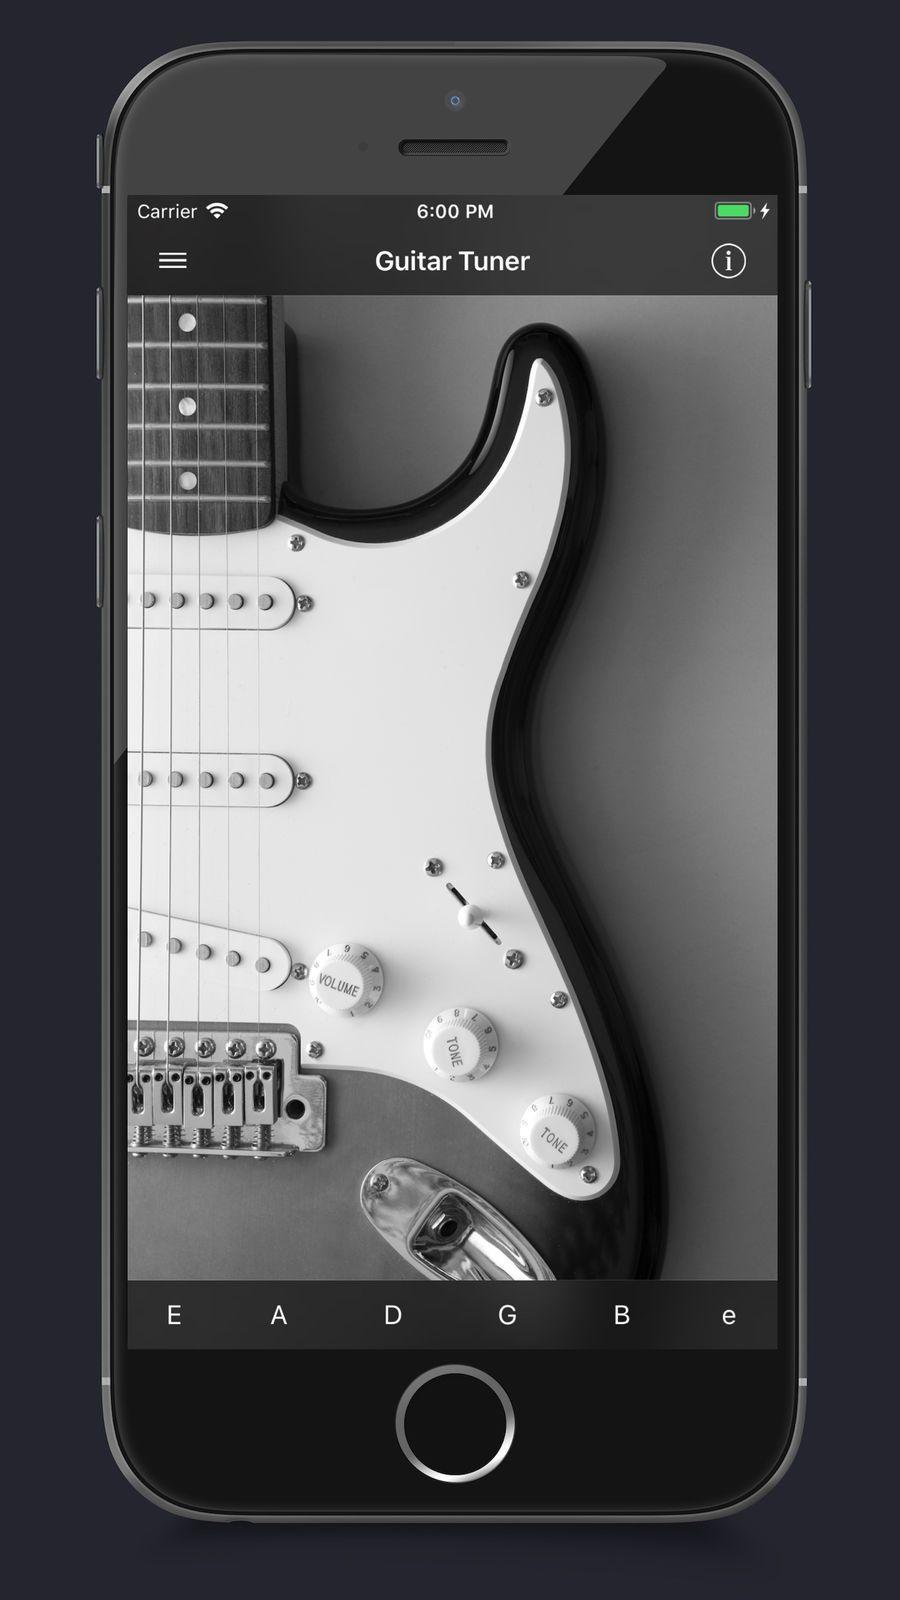 Guitar Tuner MusicUtilitiesappsios (With images